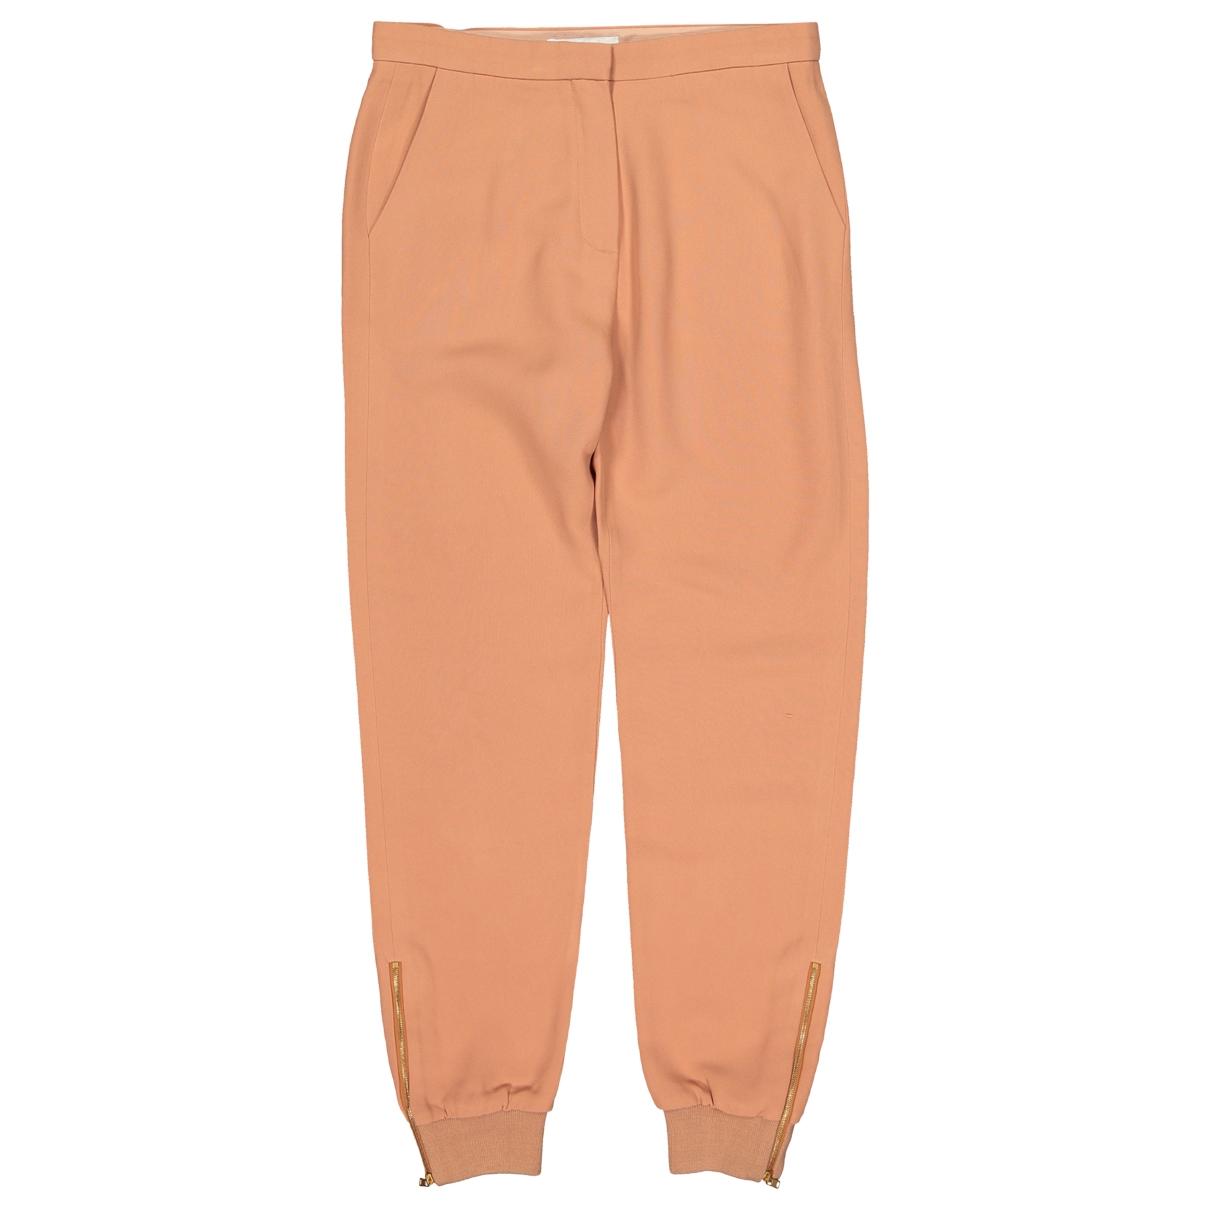 Chloé \N Brown Trousers for Women 36 FR